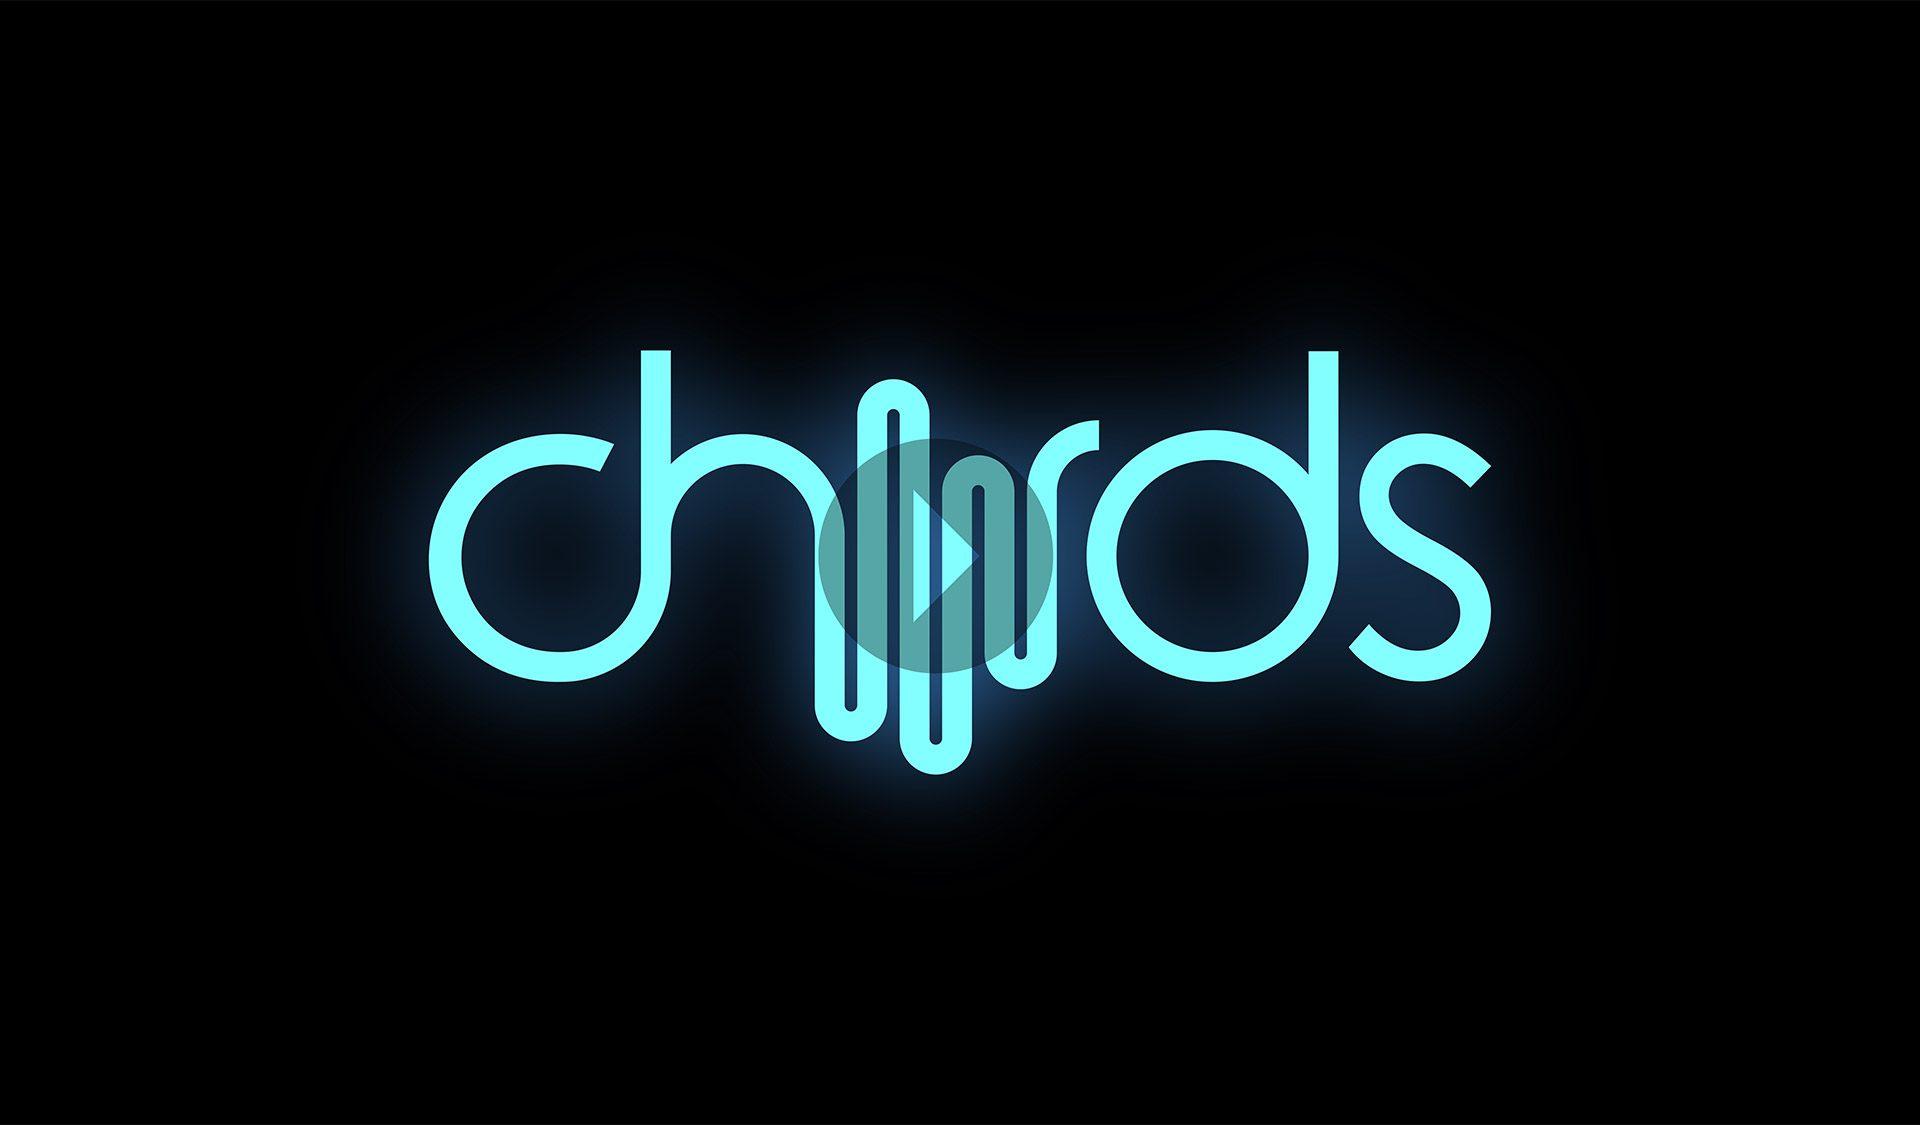 CHORDS 03